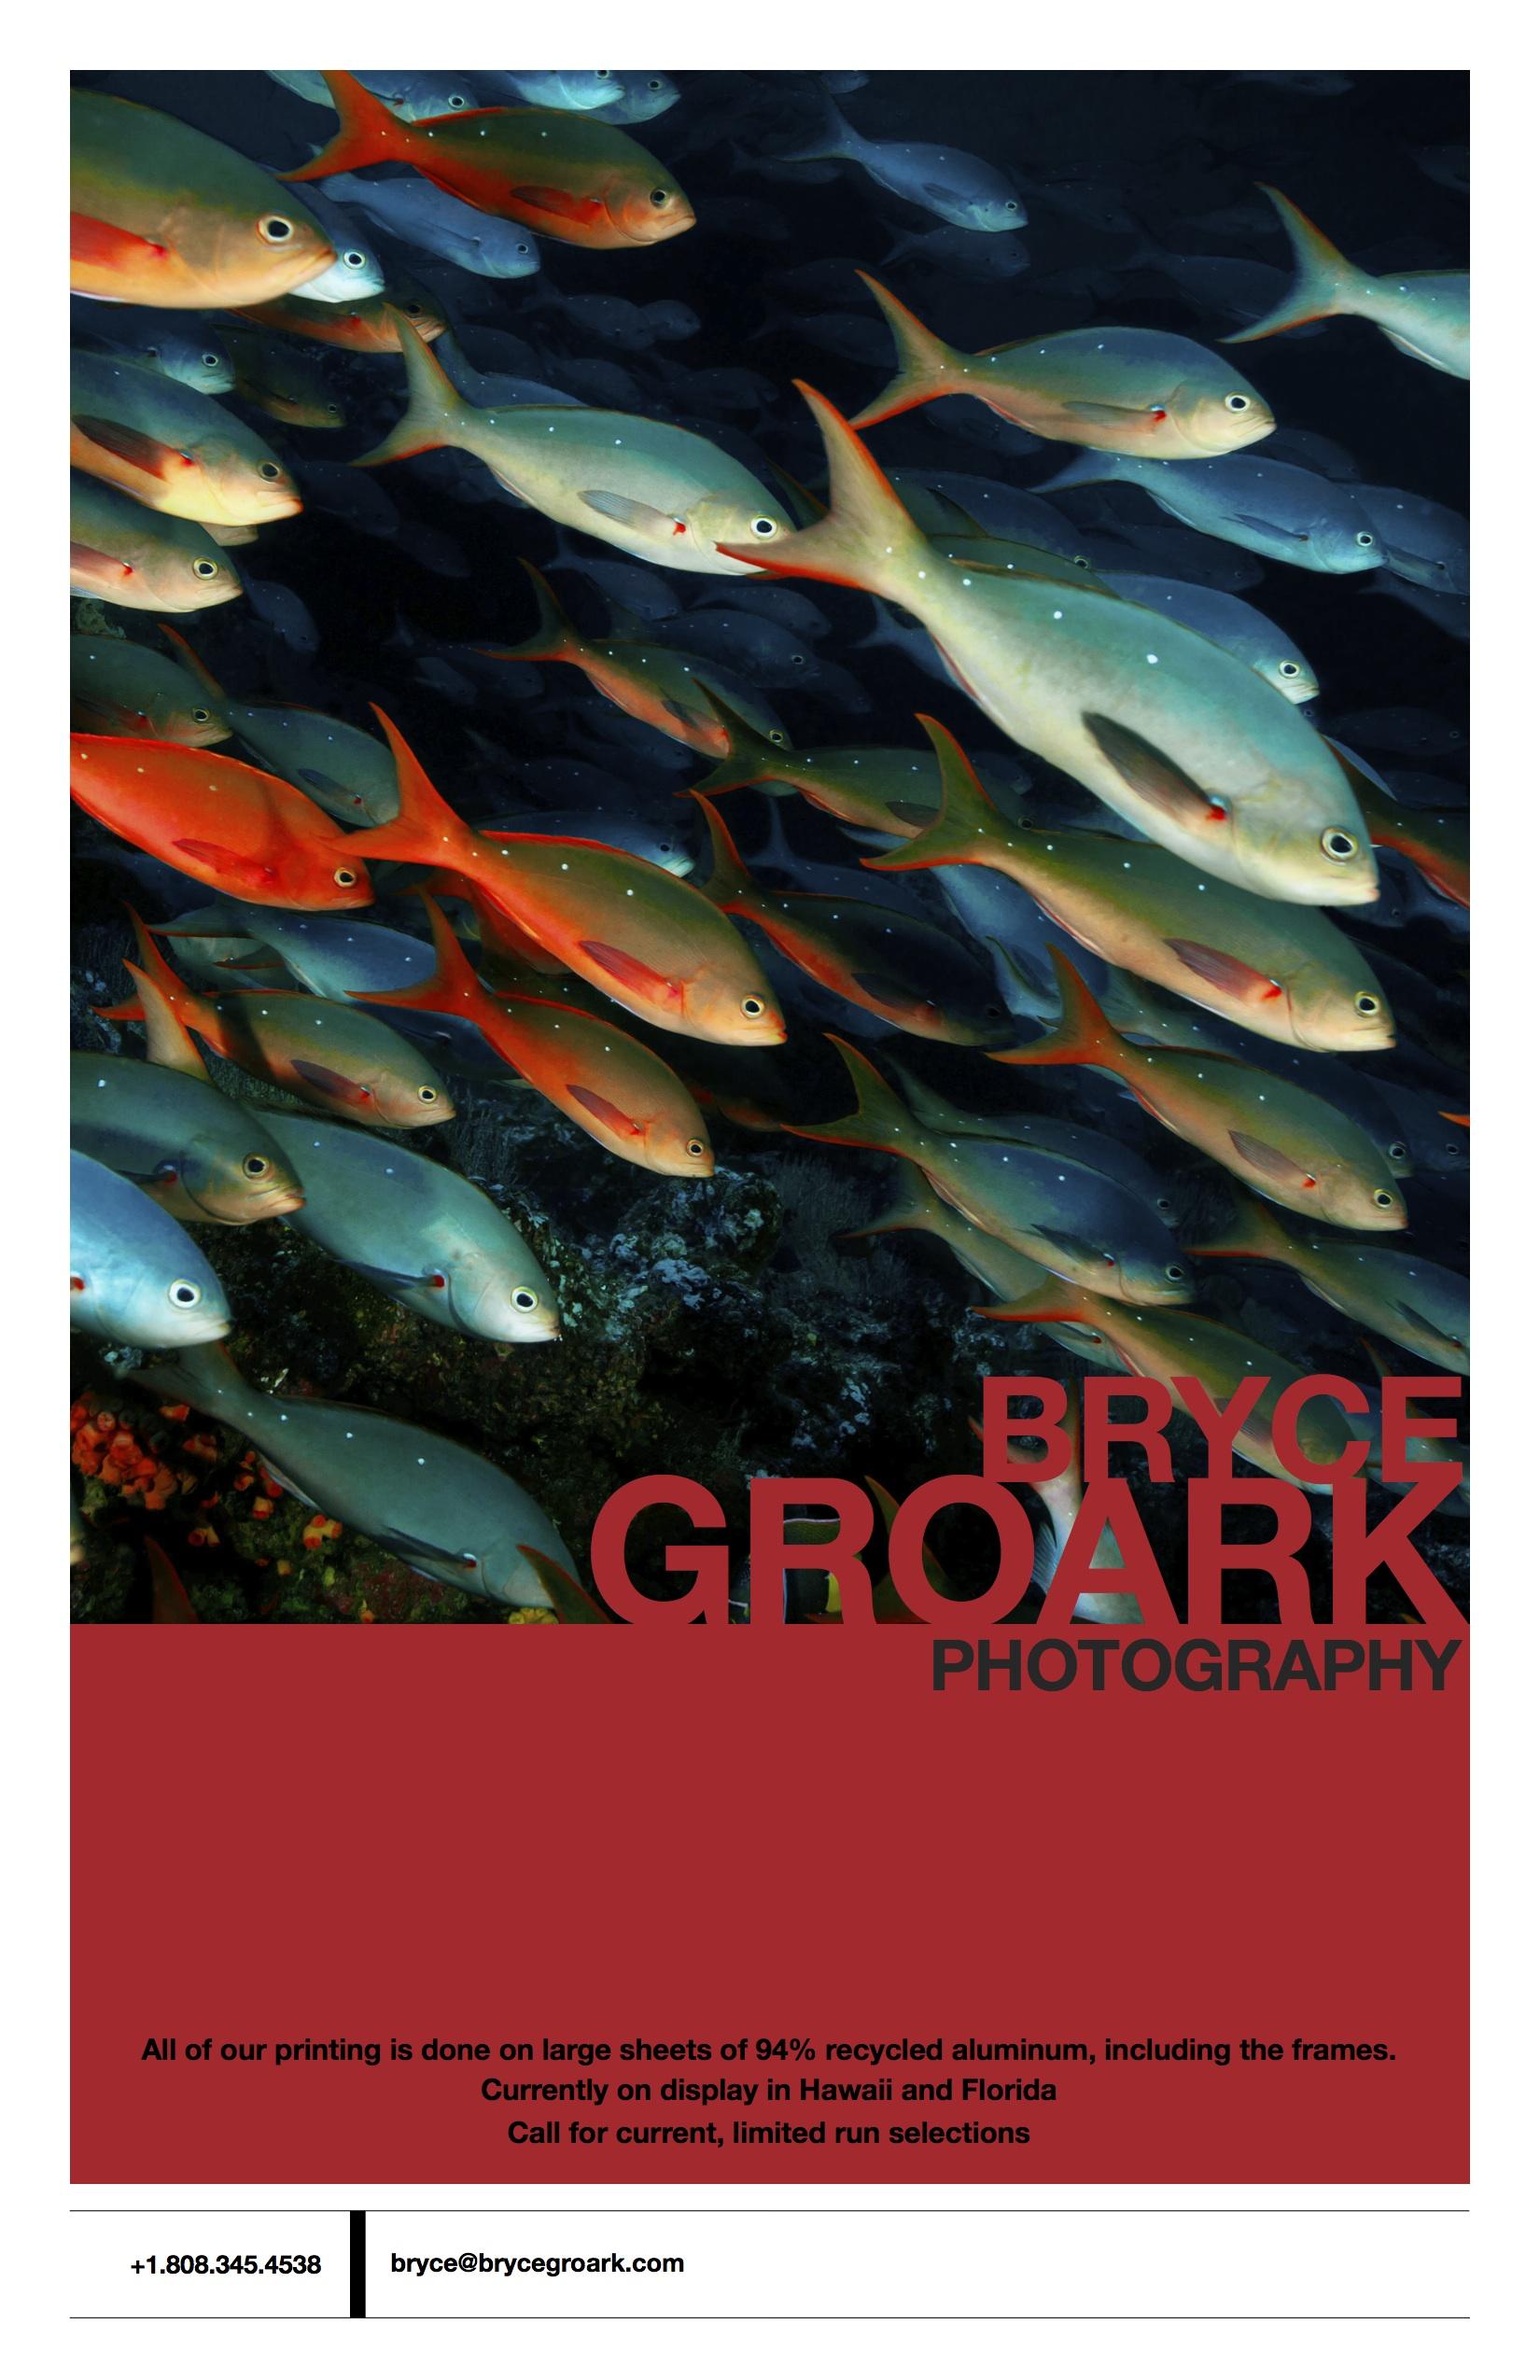 Bryce_Groark_Photography_Fine_Art_page_2_3_4